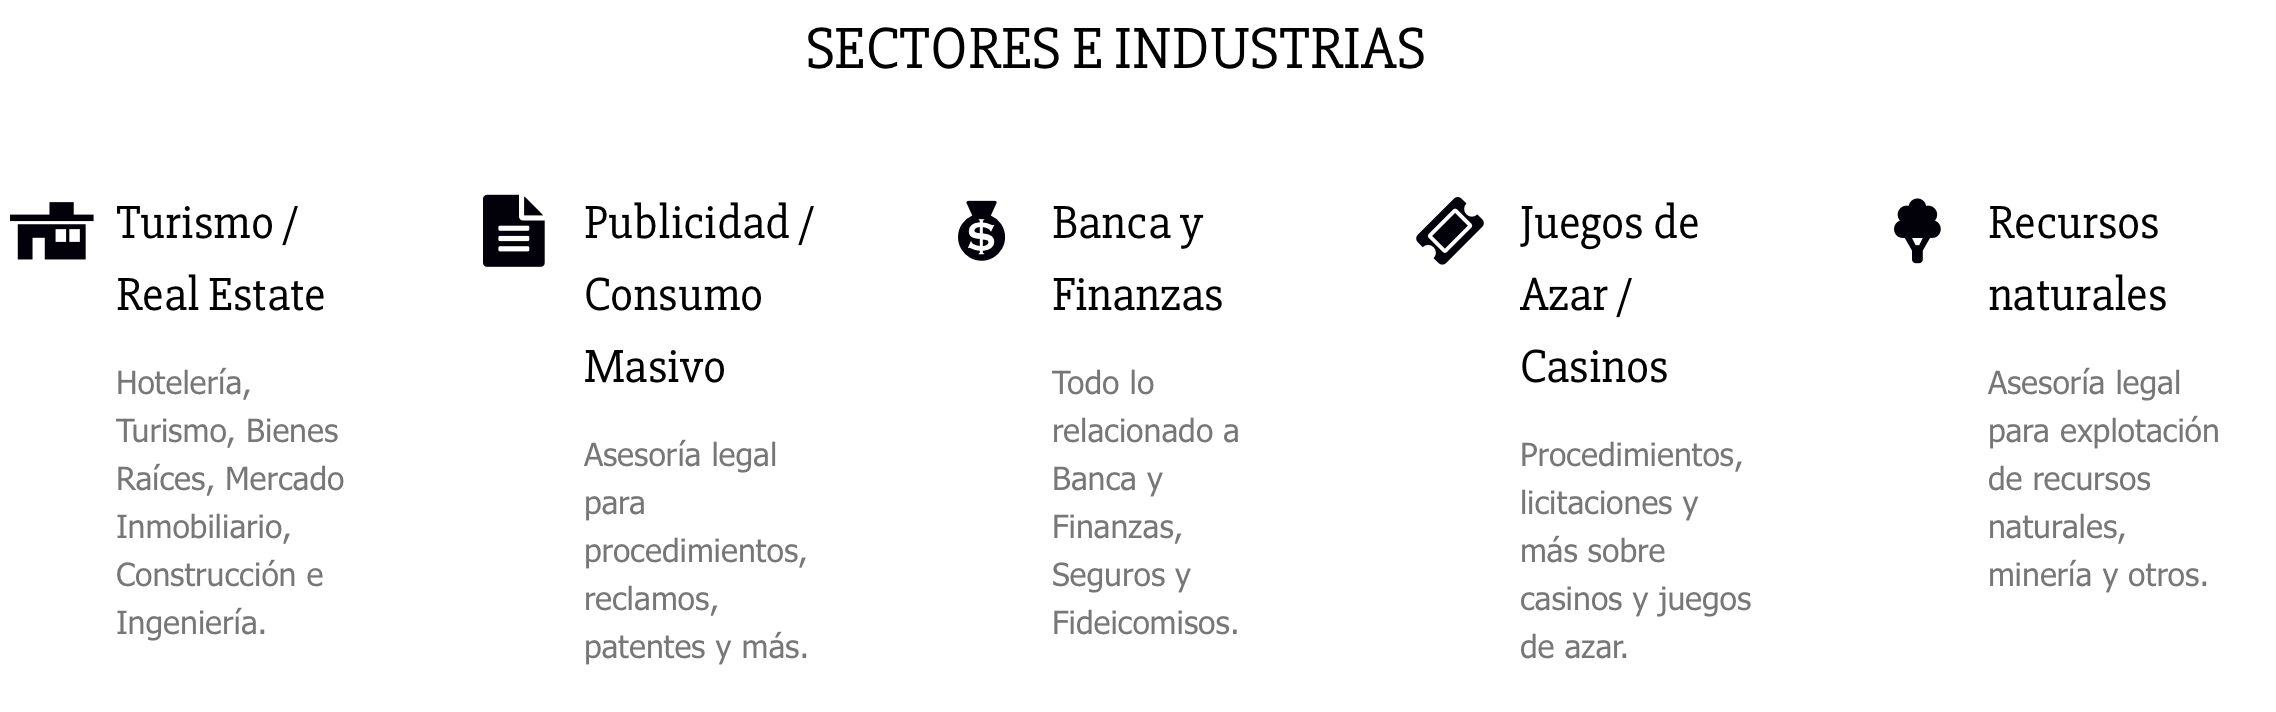 Sectores-industrias-atendidas